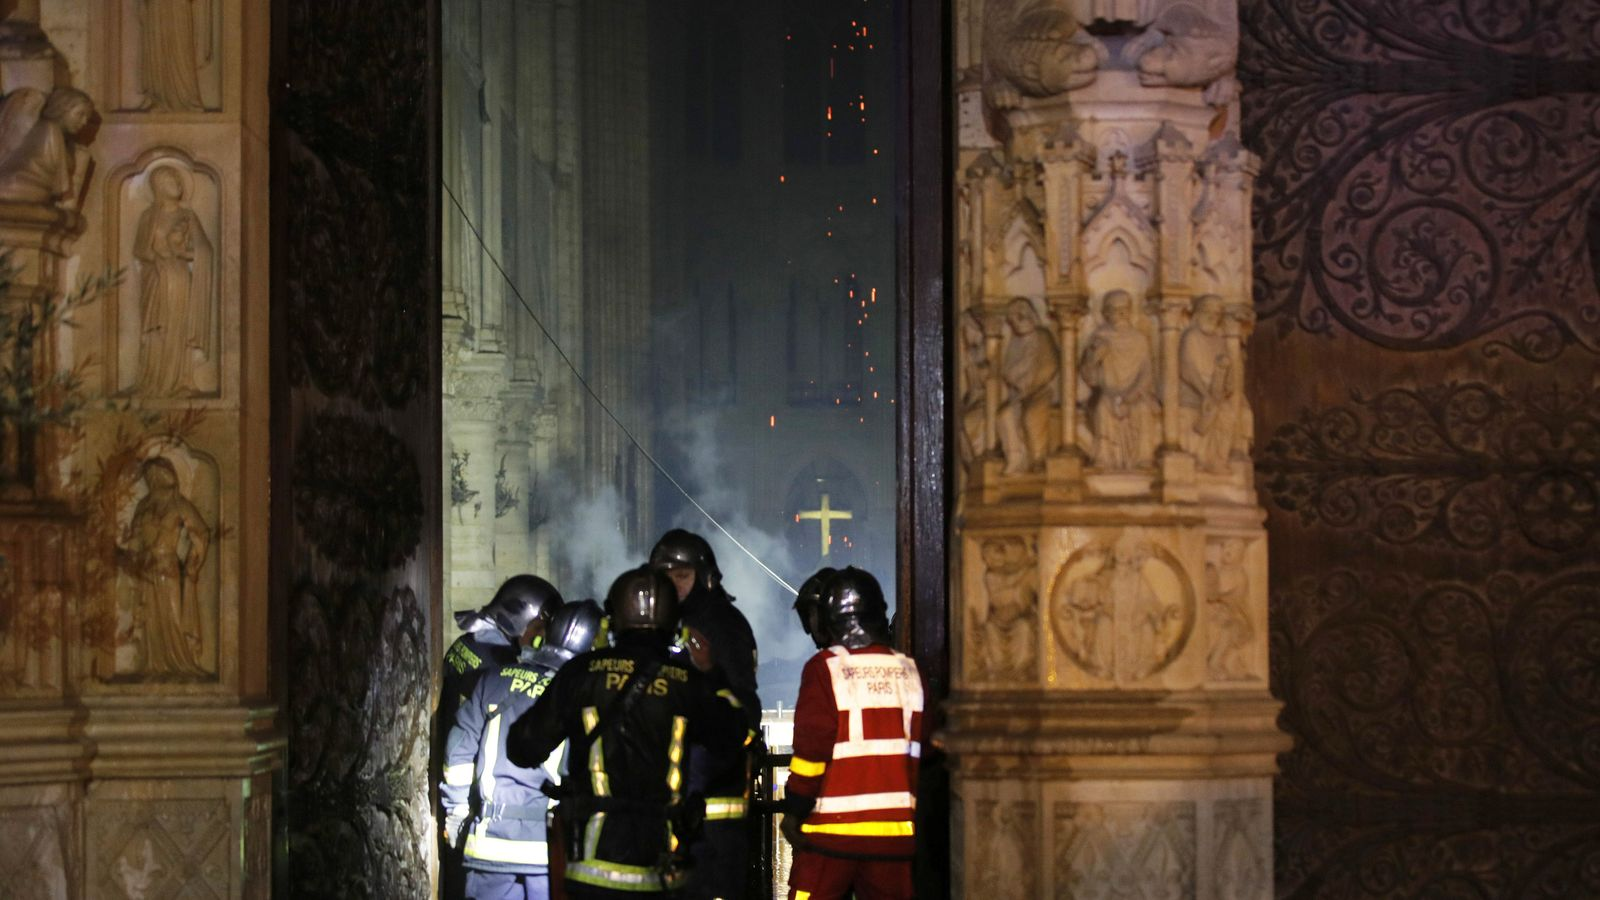 400 pemadam kebakaran dikerahkan